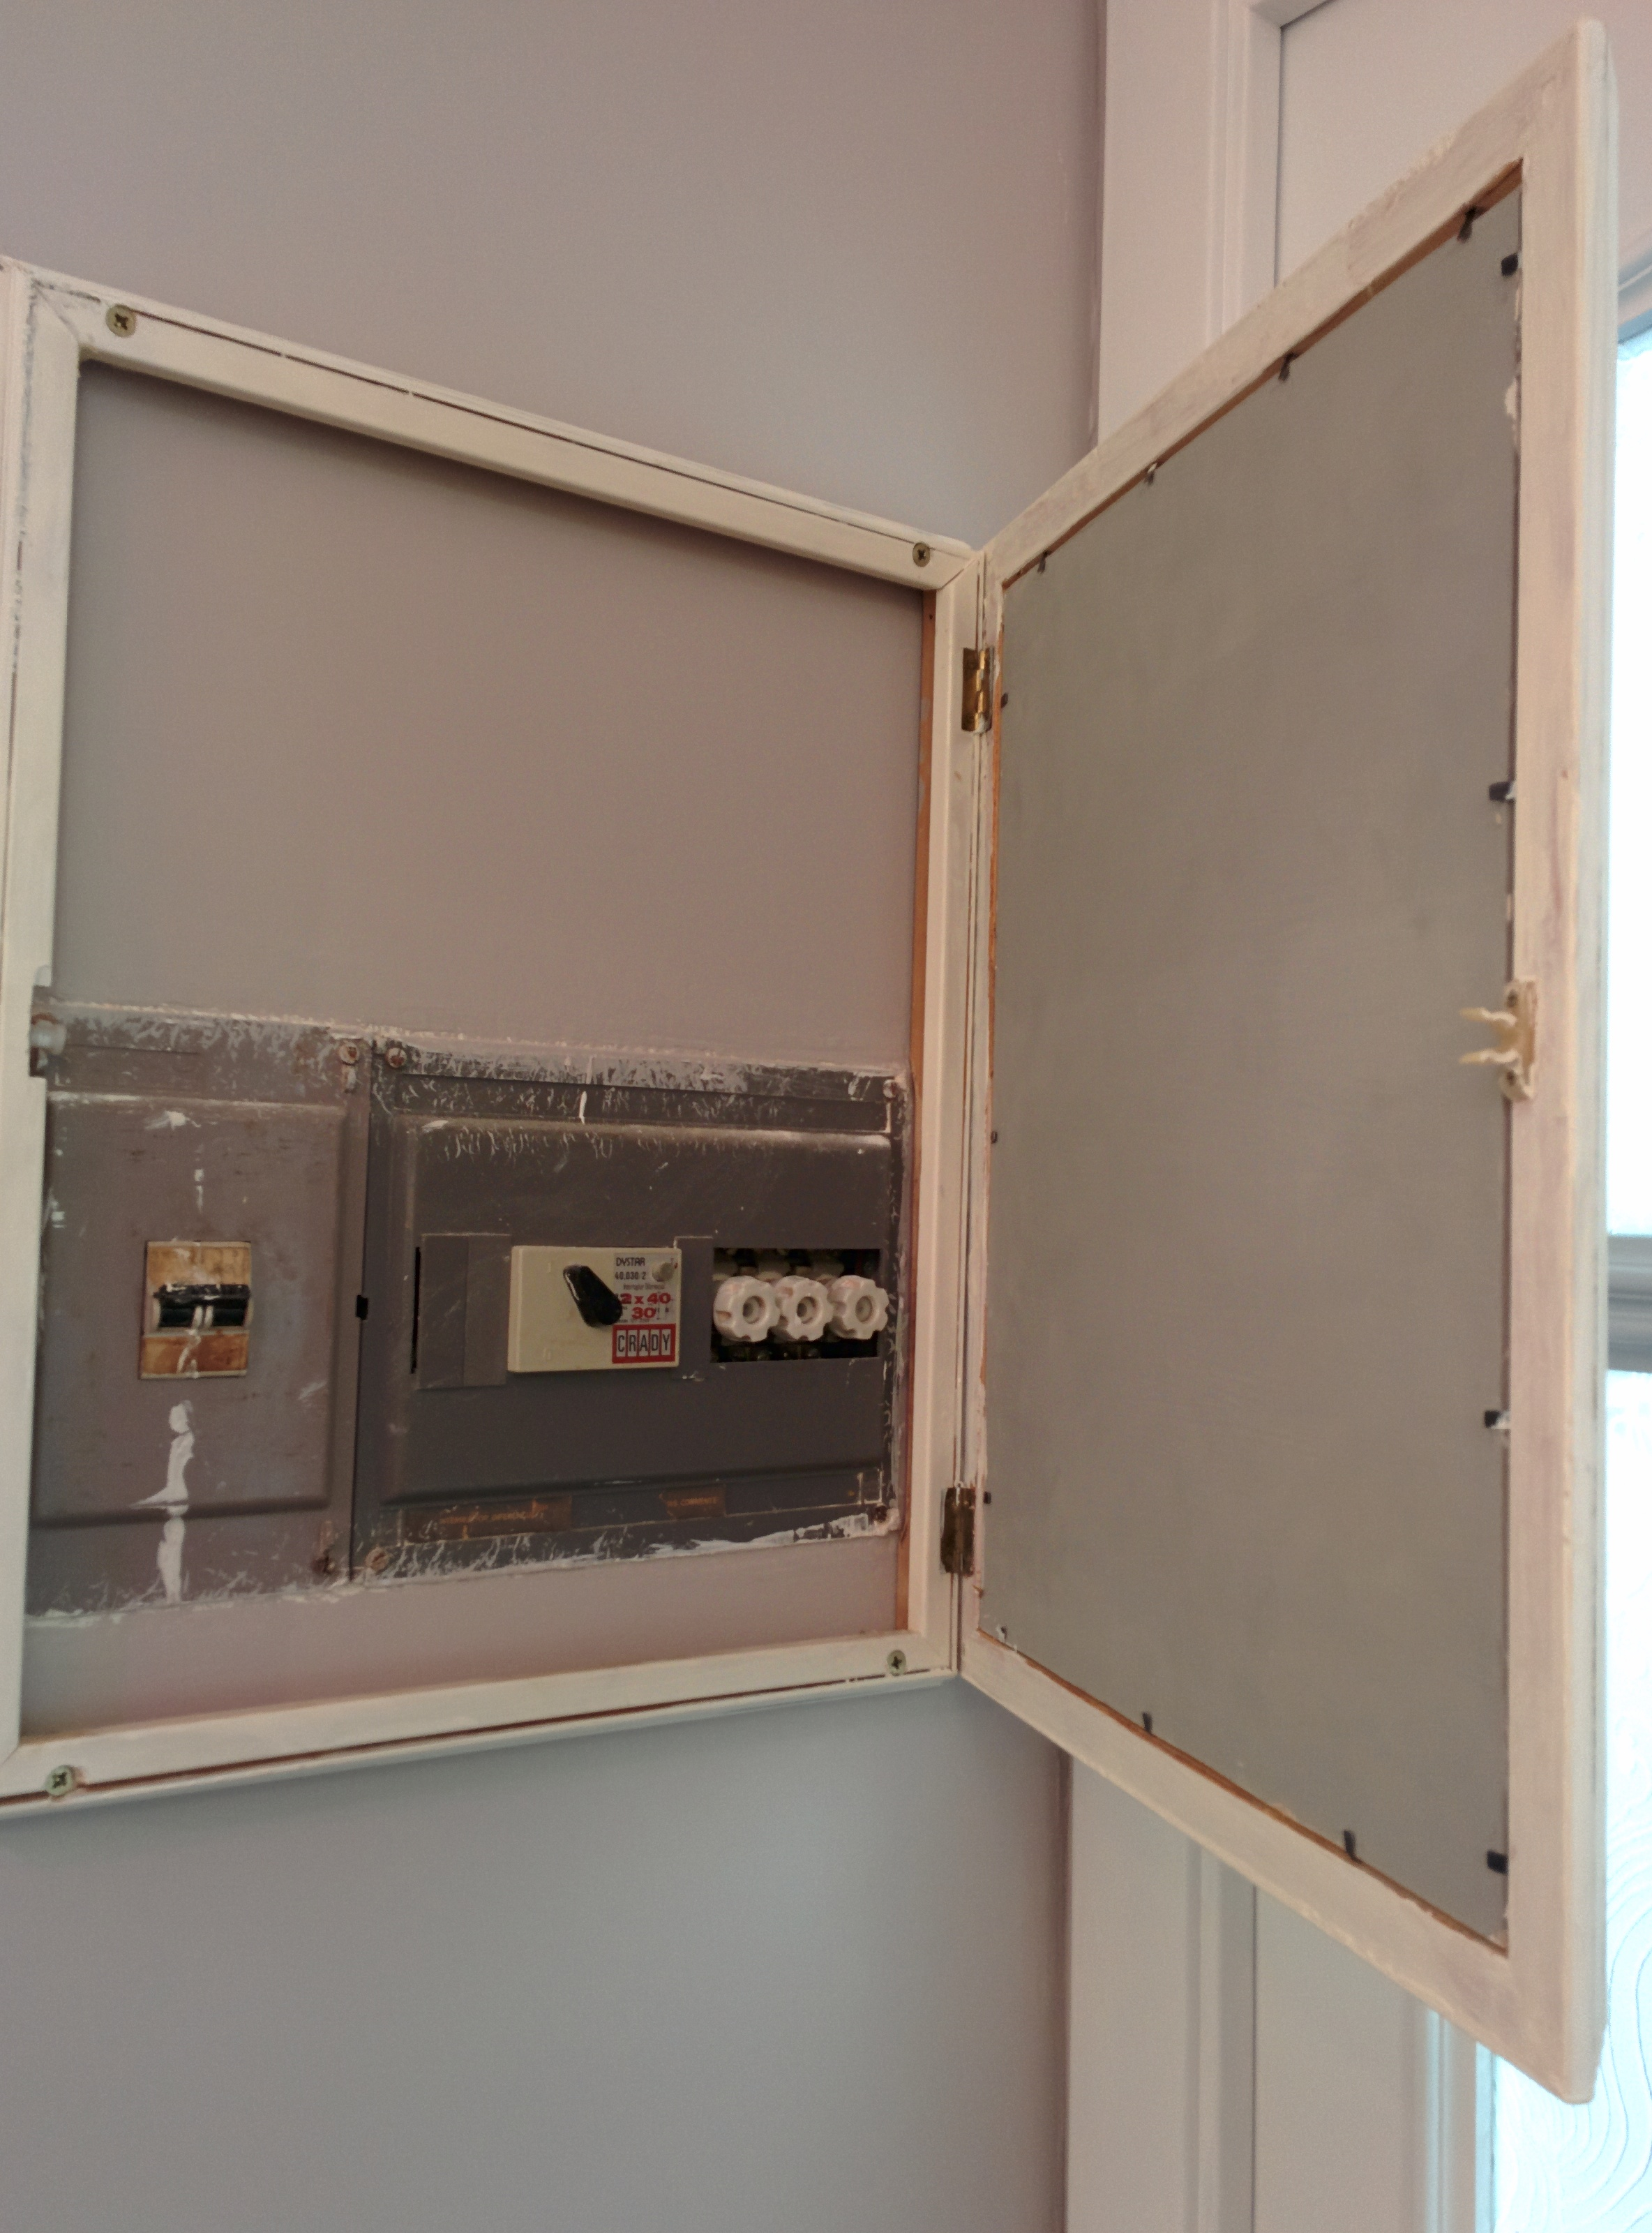 Cuadro el ctrico distribution panel la casa del gat blanc for Caja cuadro electrico